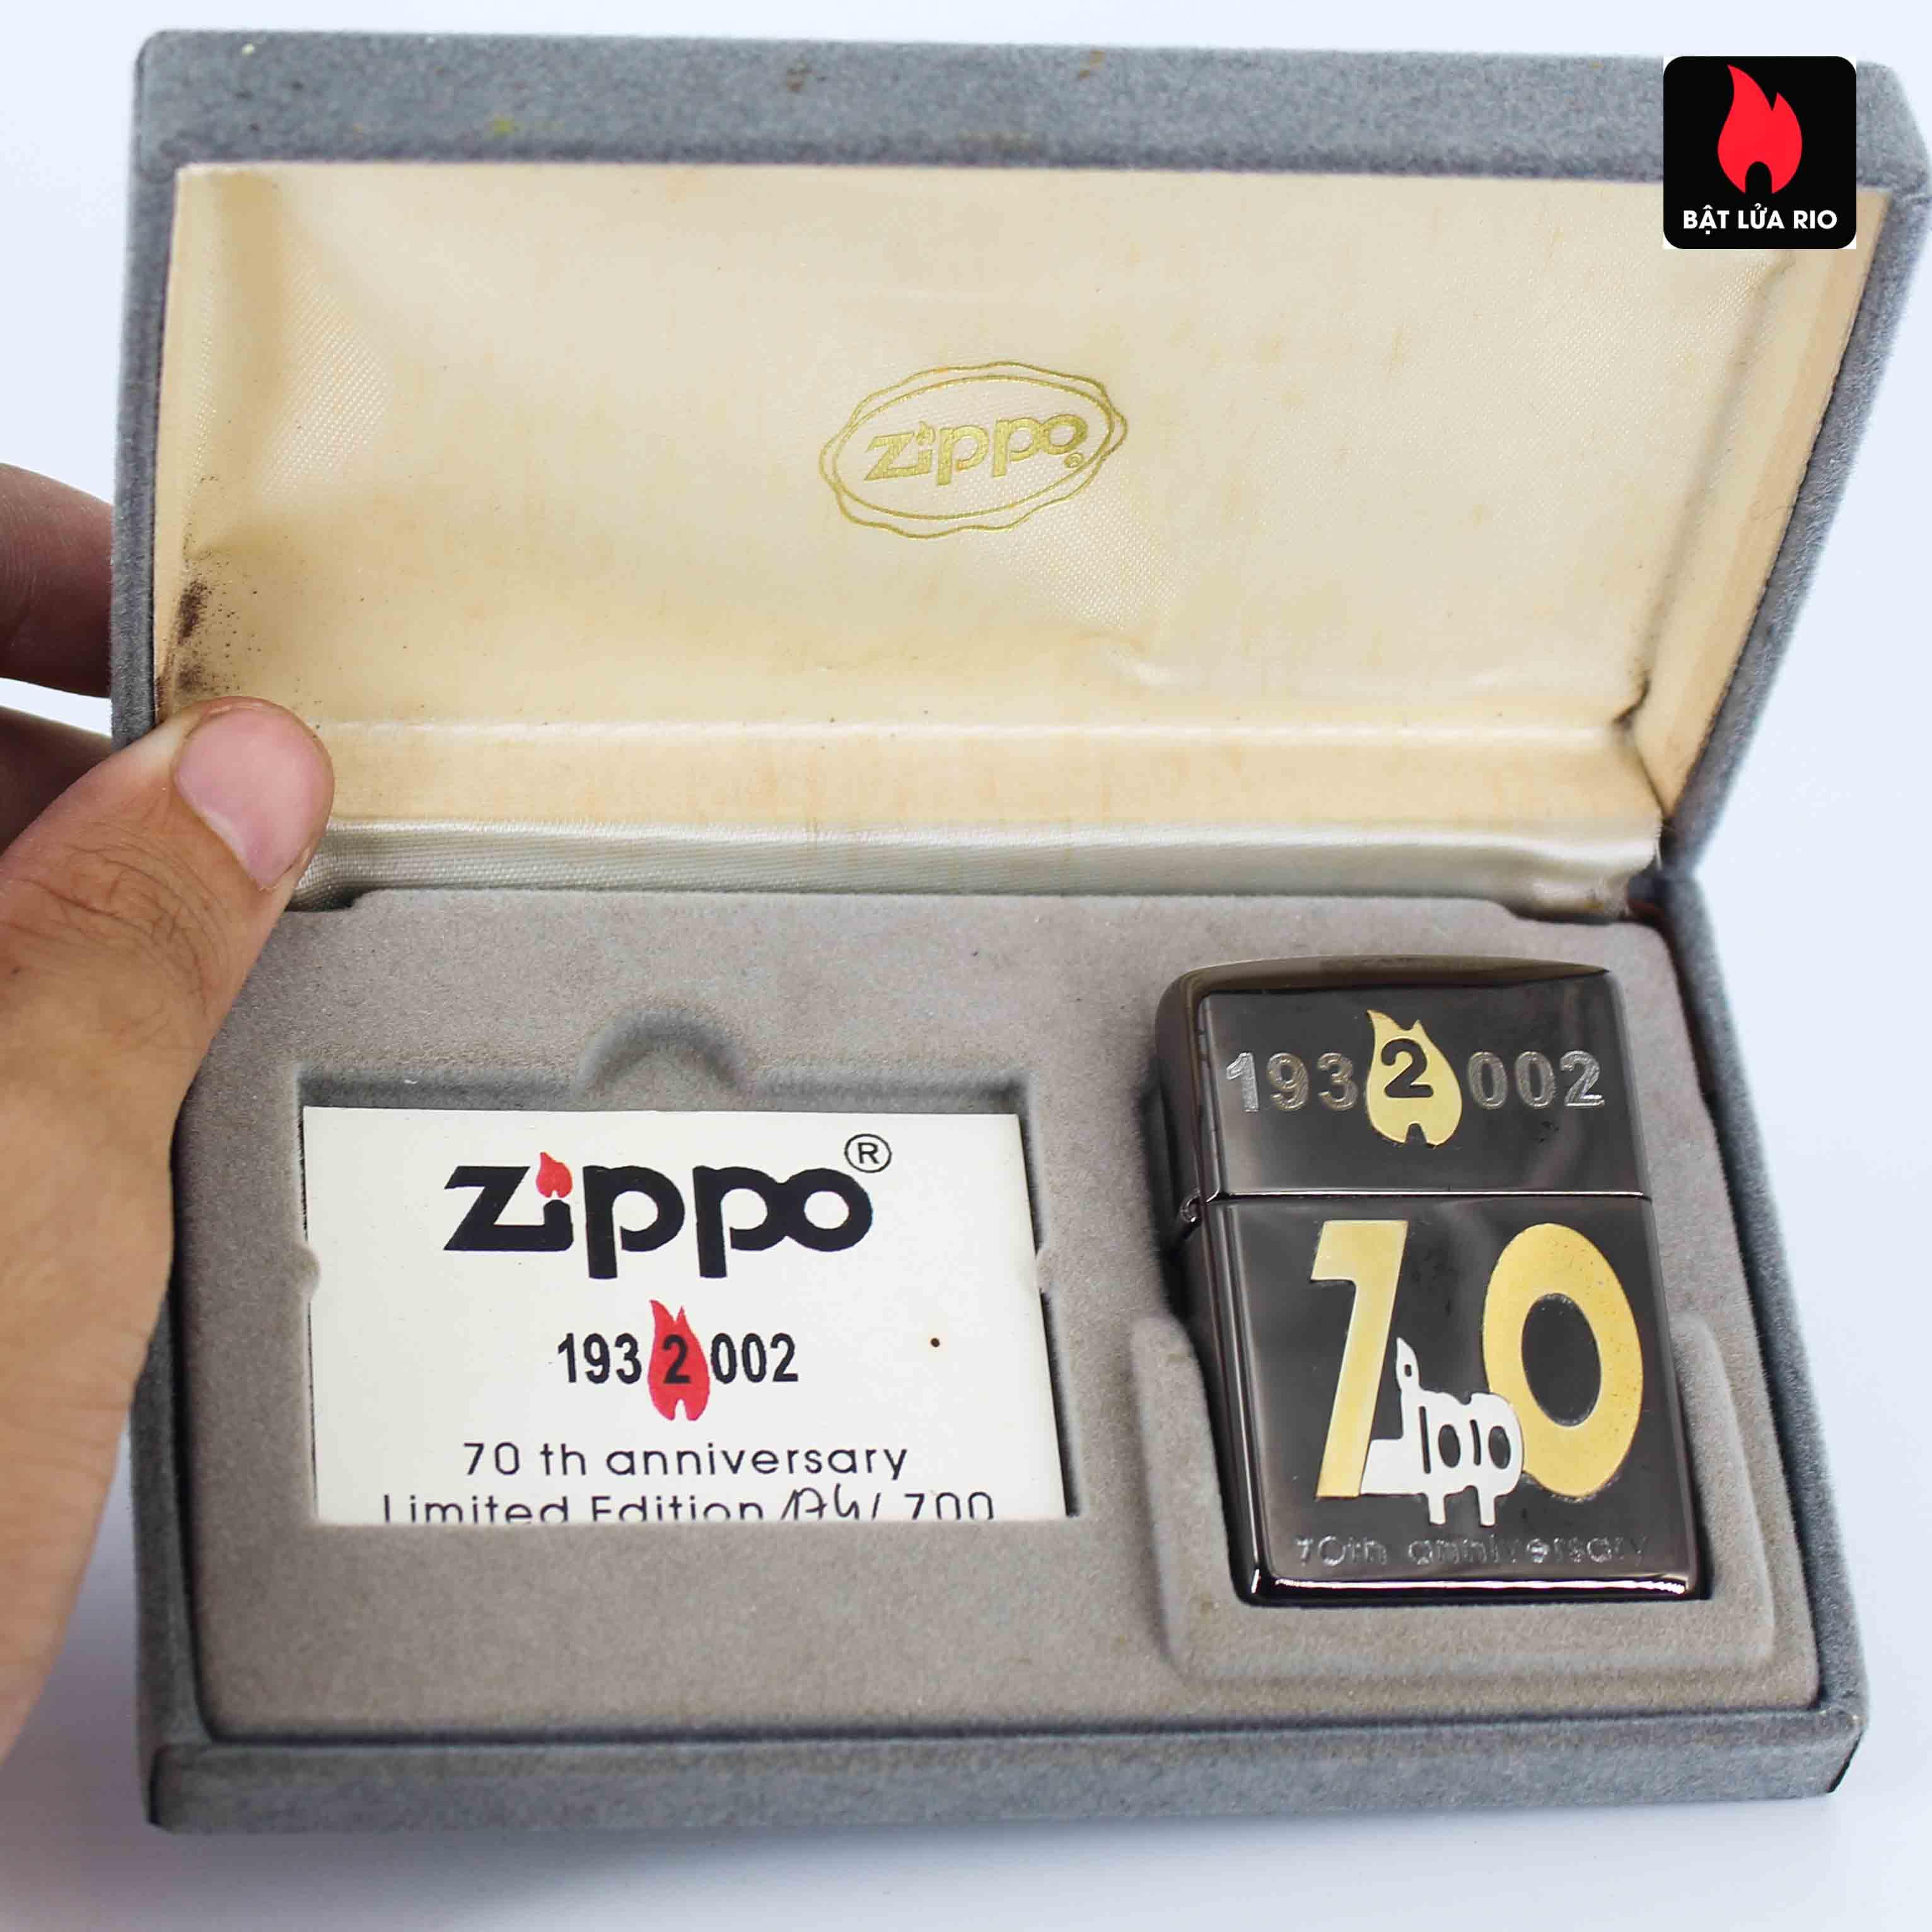 Zippo 2001 - 70th Anniversary - Limited 174/700